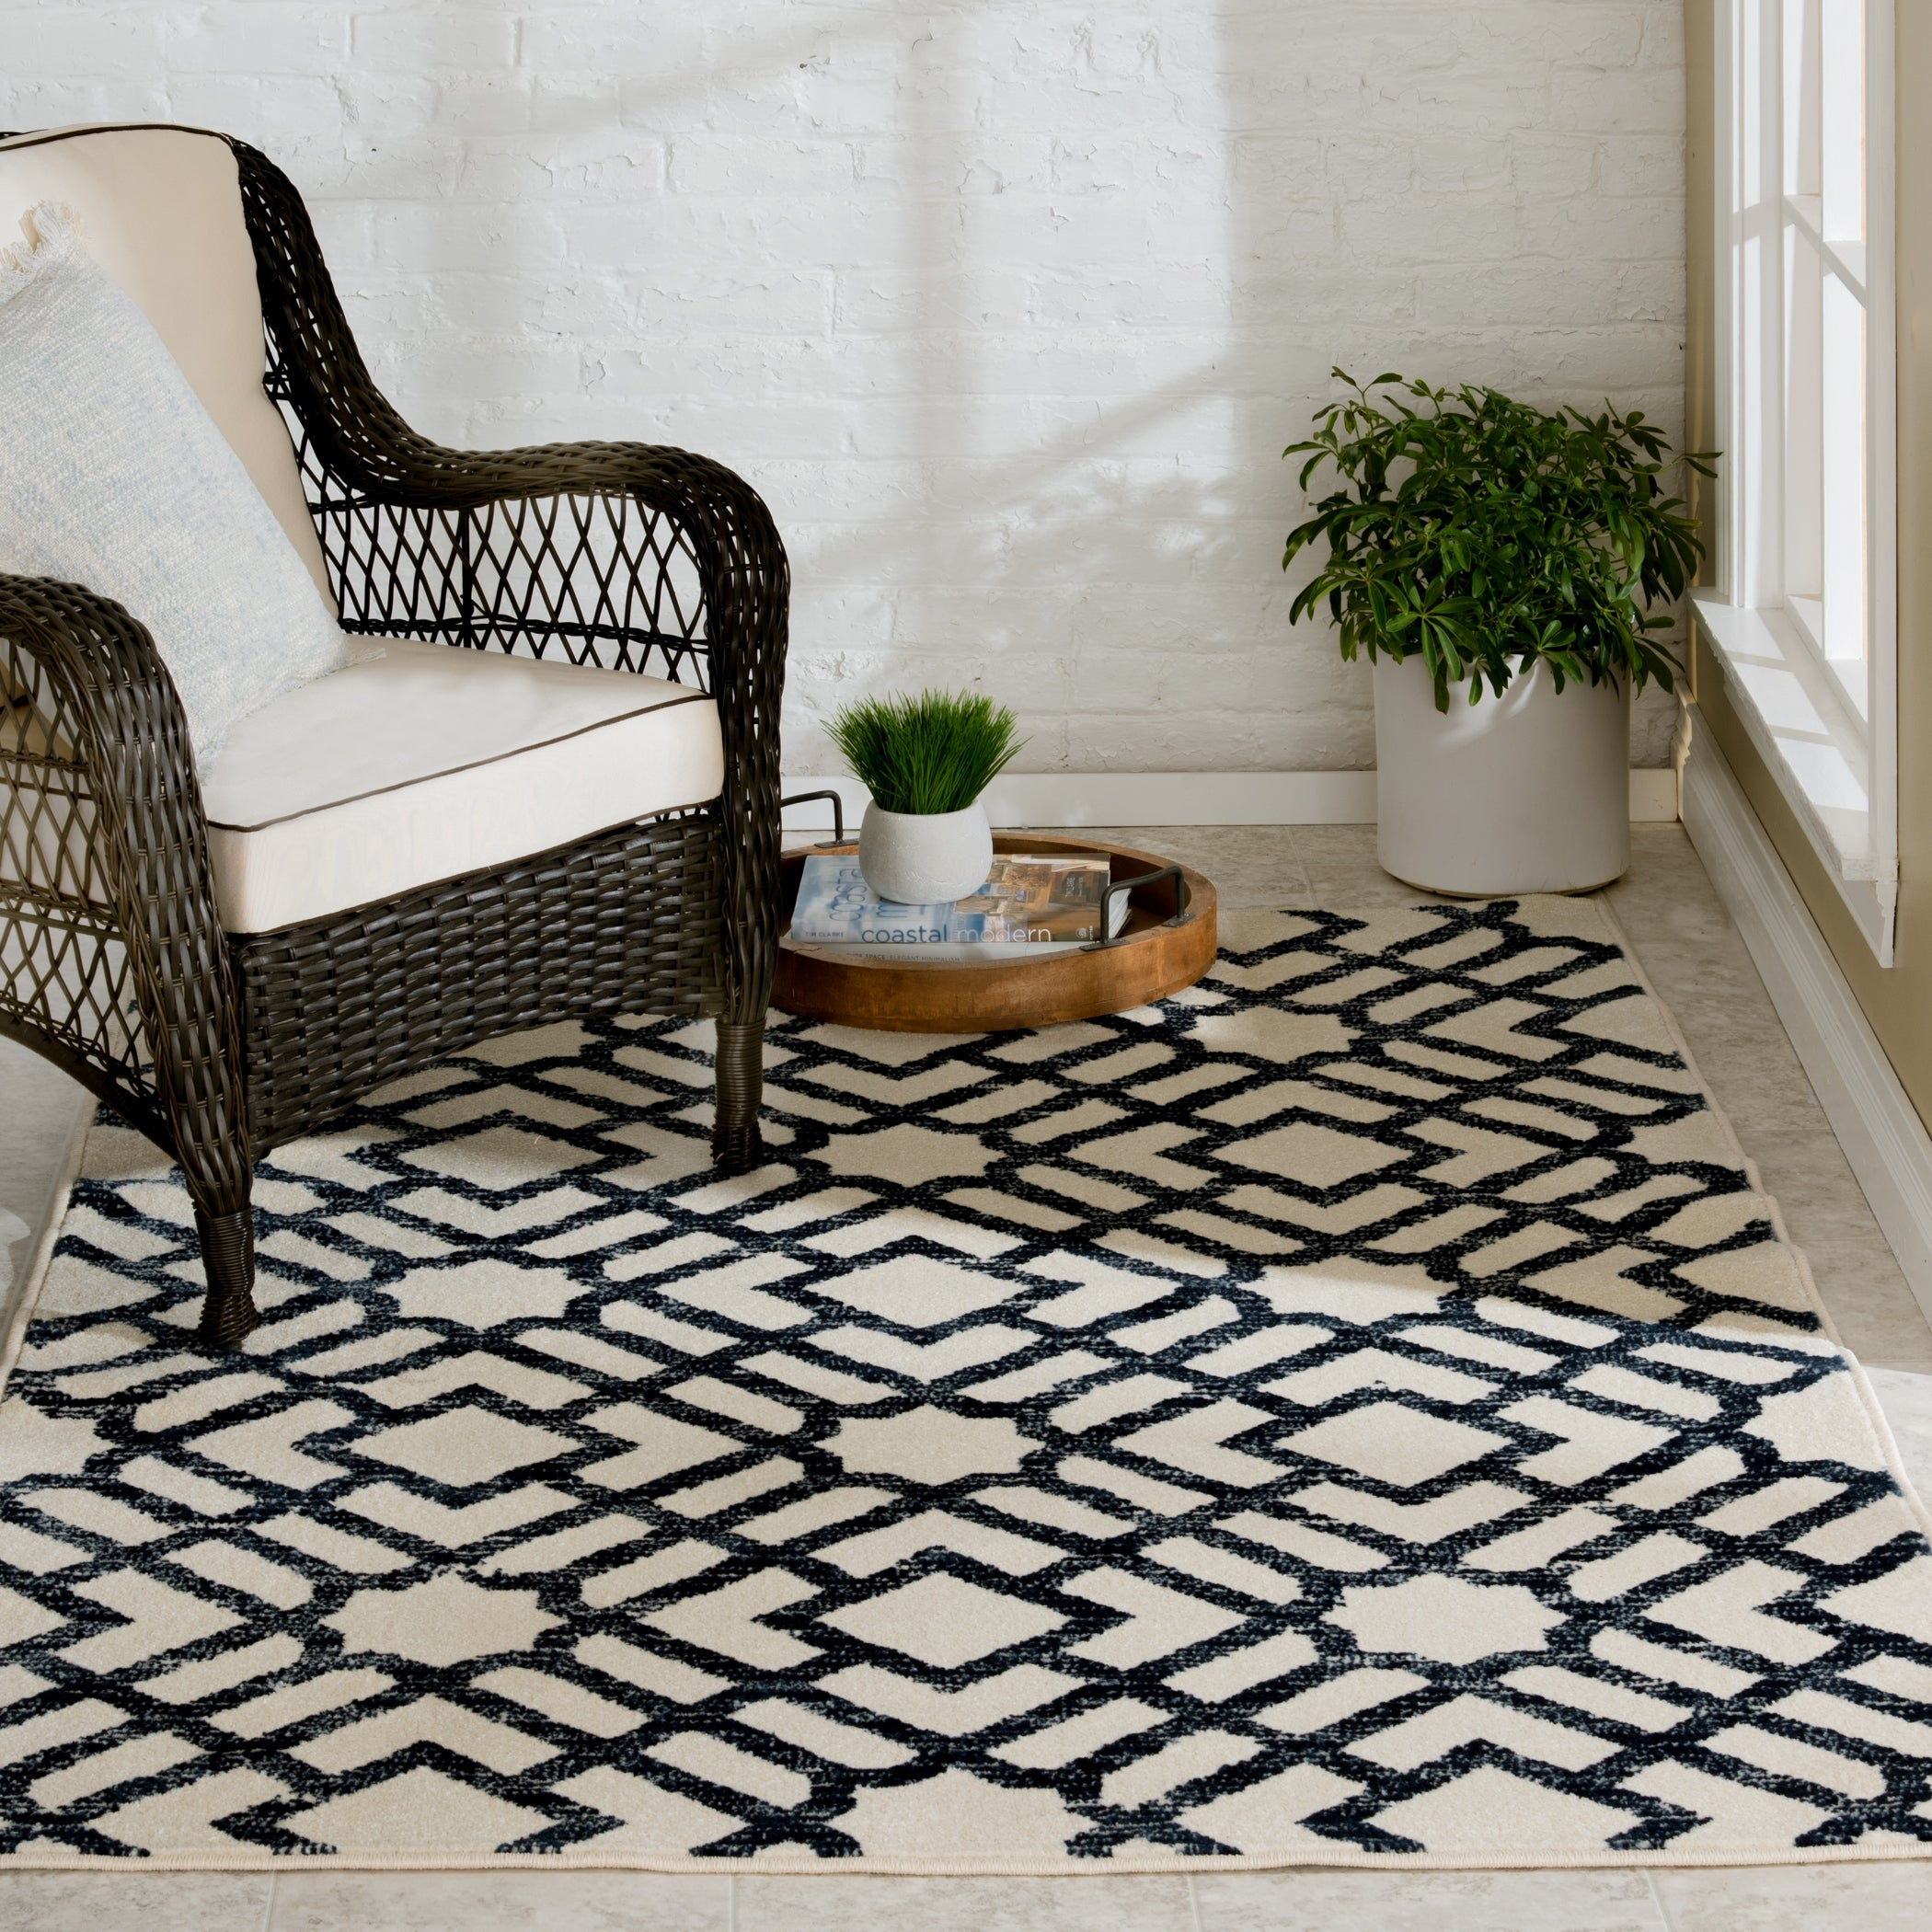 Trisha Yearwood Home Newell Snow Sapphire Indoor Outdoor Area Rug Overstock 31476000